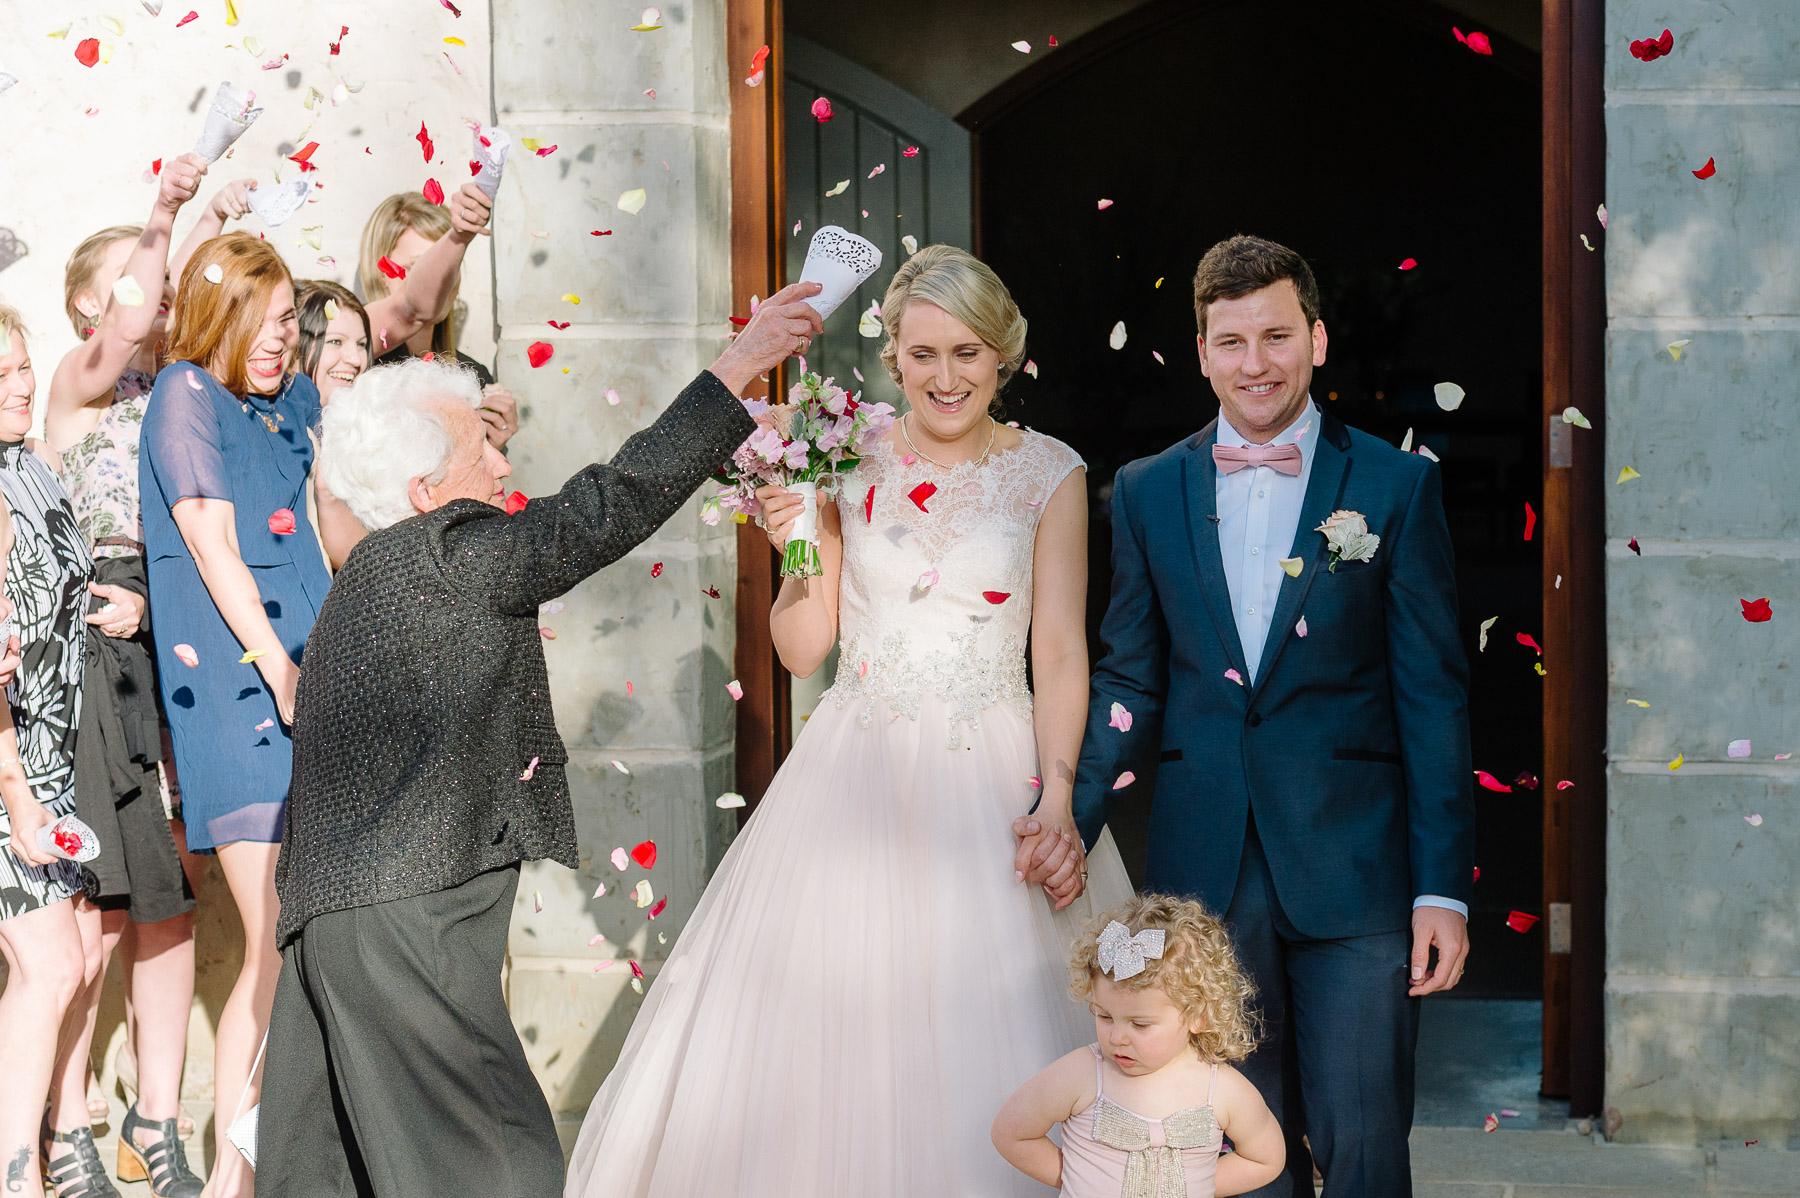 Marnie_and_Charlie_Yarra_Valley_Wedding_Blog-57.jpg